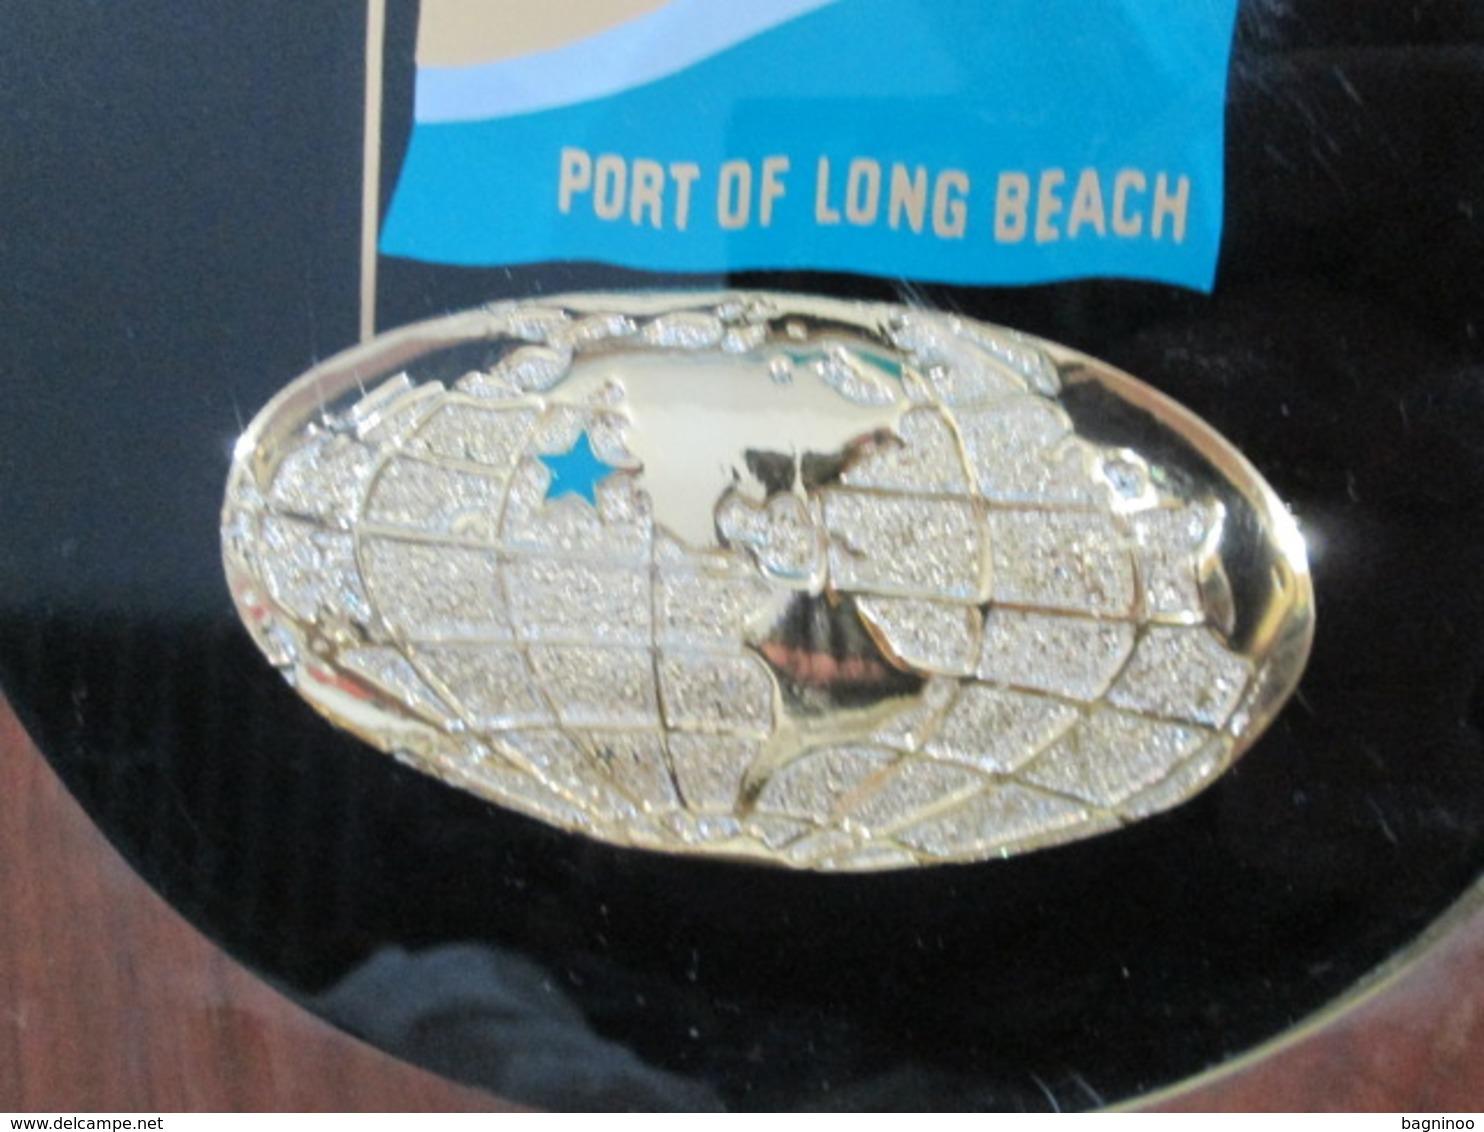 Port Of Long Beach Memorial Plaque To Sister City Split Yugoslavia 1974 - Obj. 'Remember Of'